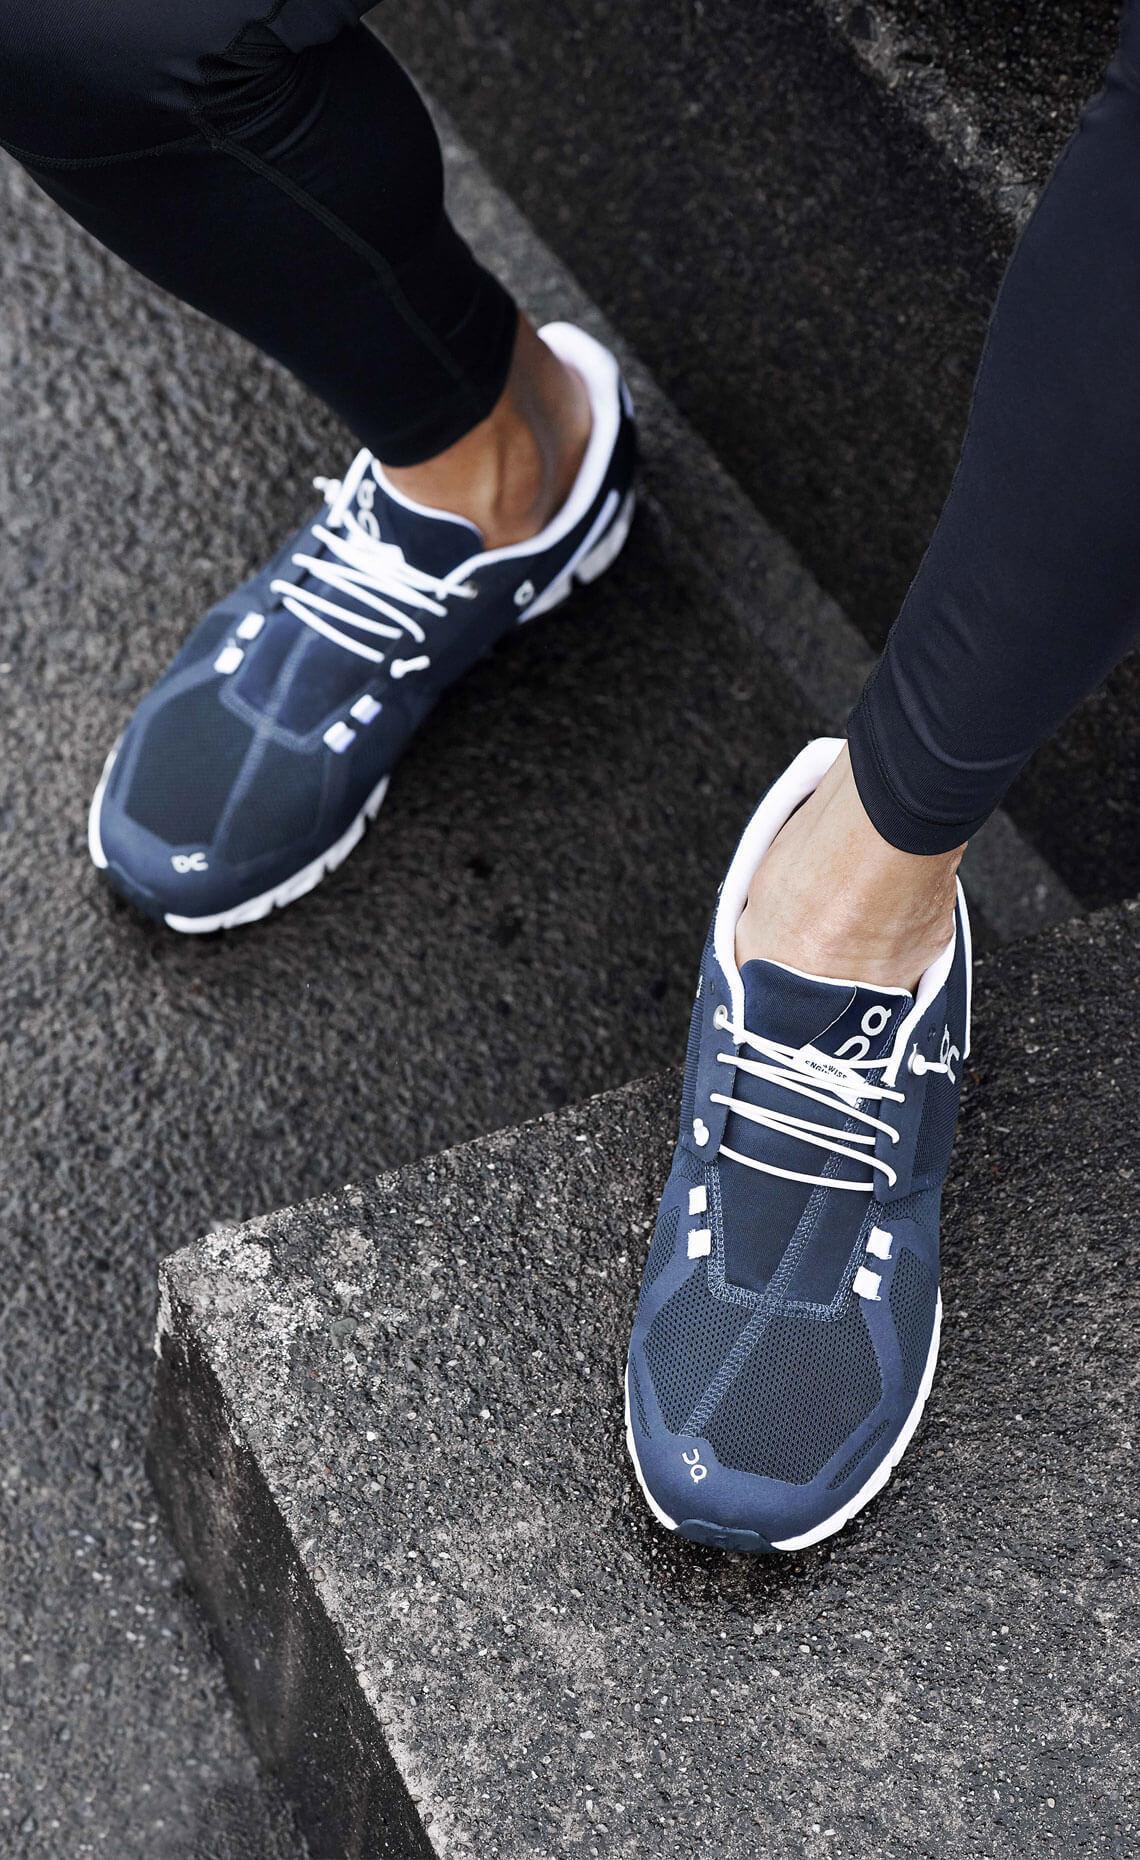 Cloud - Cushioned Running Shoe - Mens | On